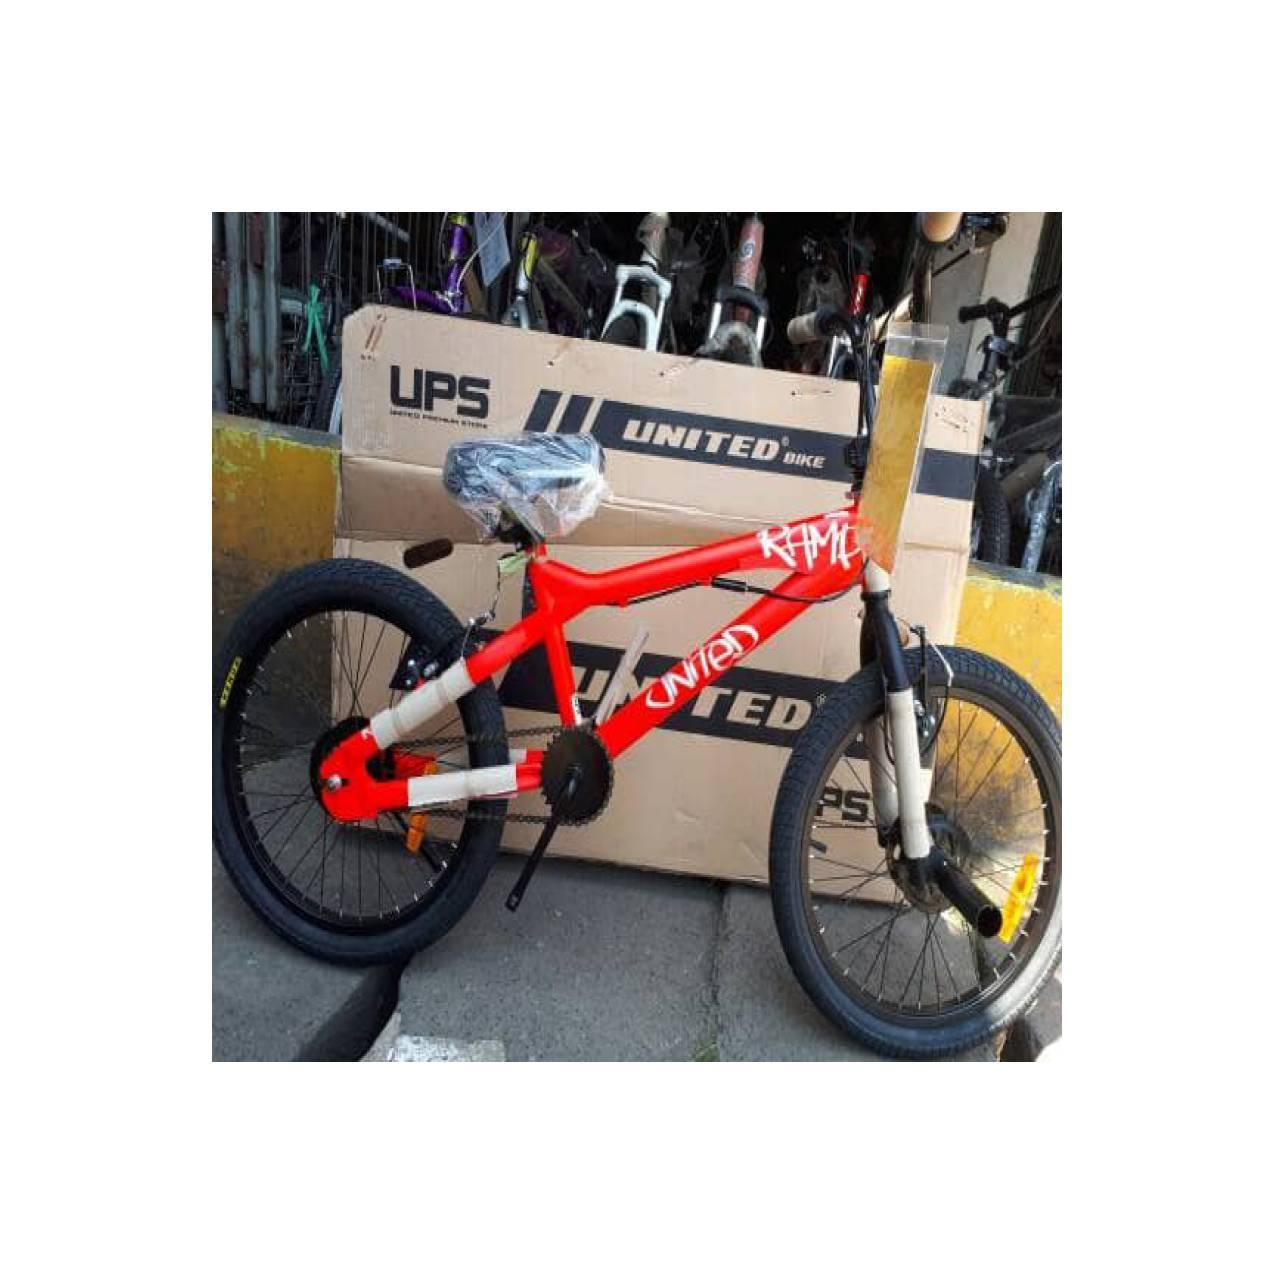 Sepeda Bmx 20 United RAMP Limited Edition